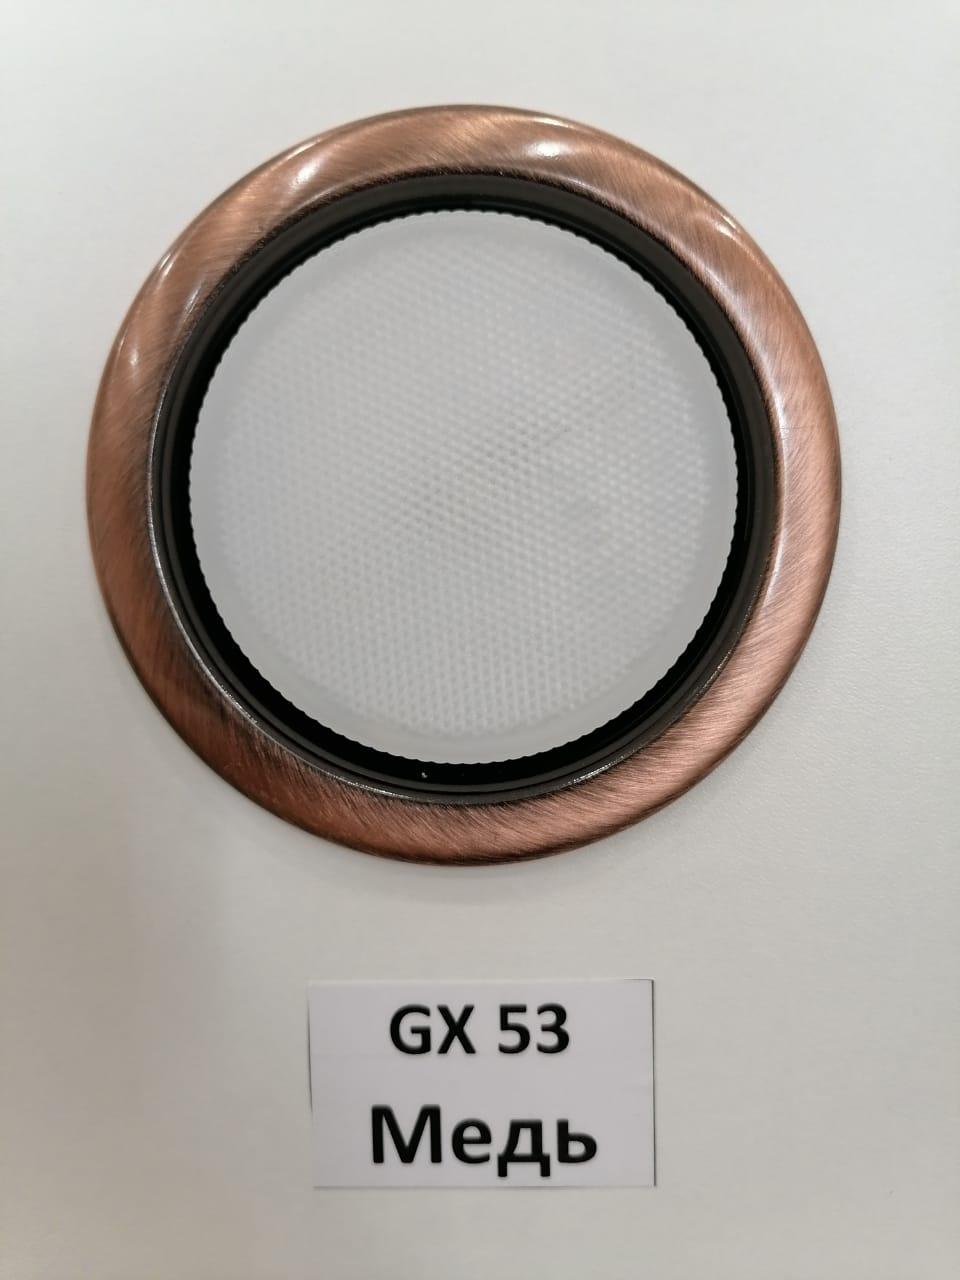 GX53 Медь